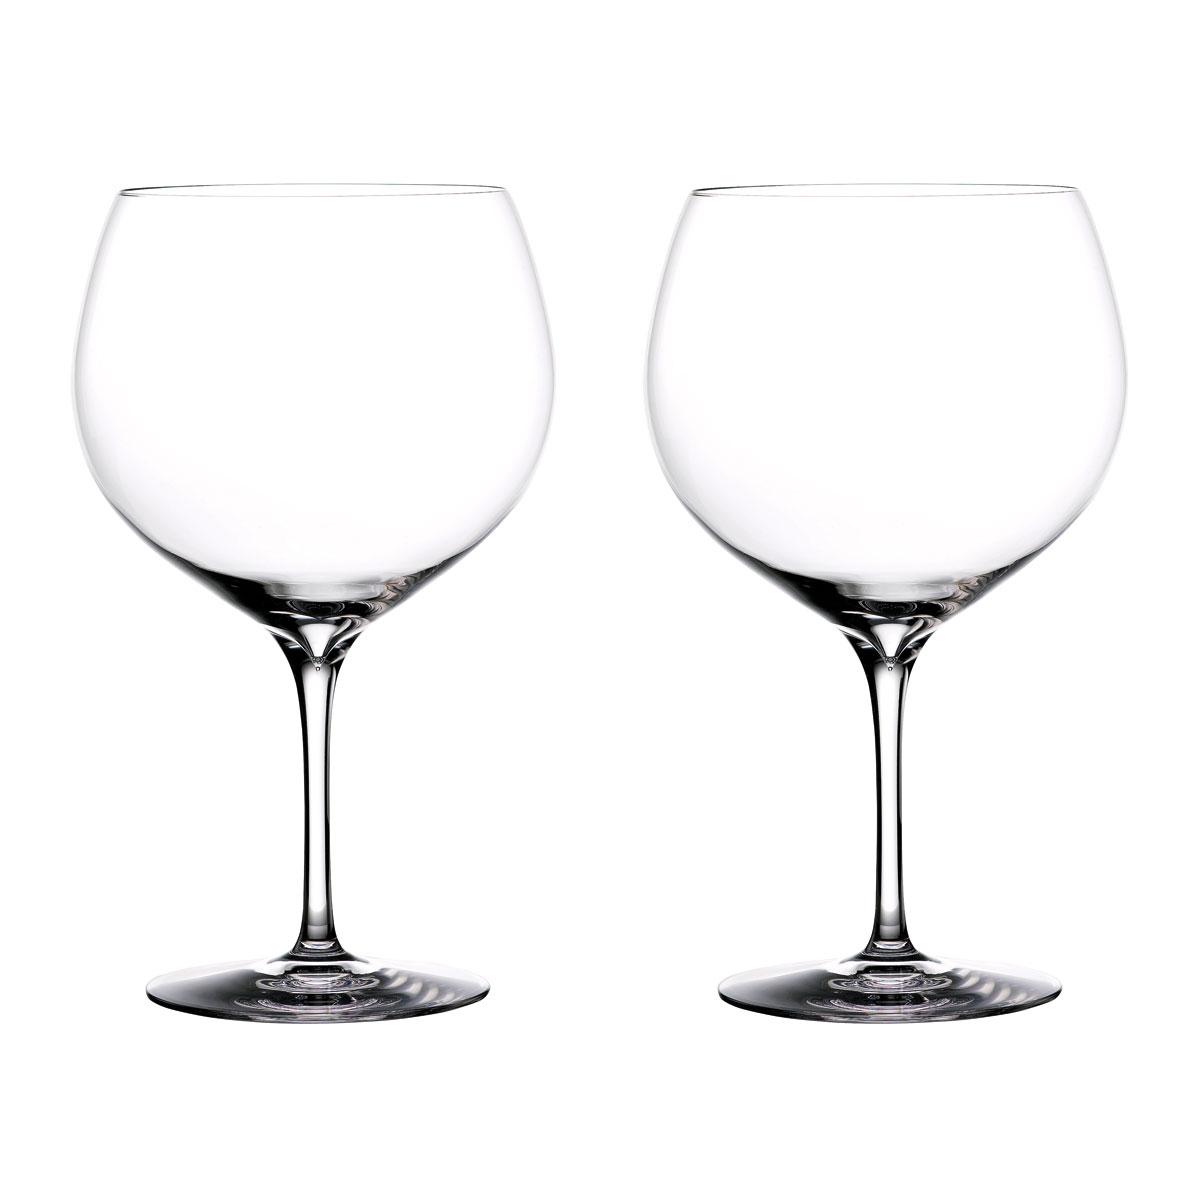 Waterford Crystal Gin Journeys Elegance Balloon Glasses, Pair